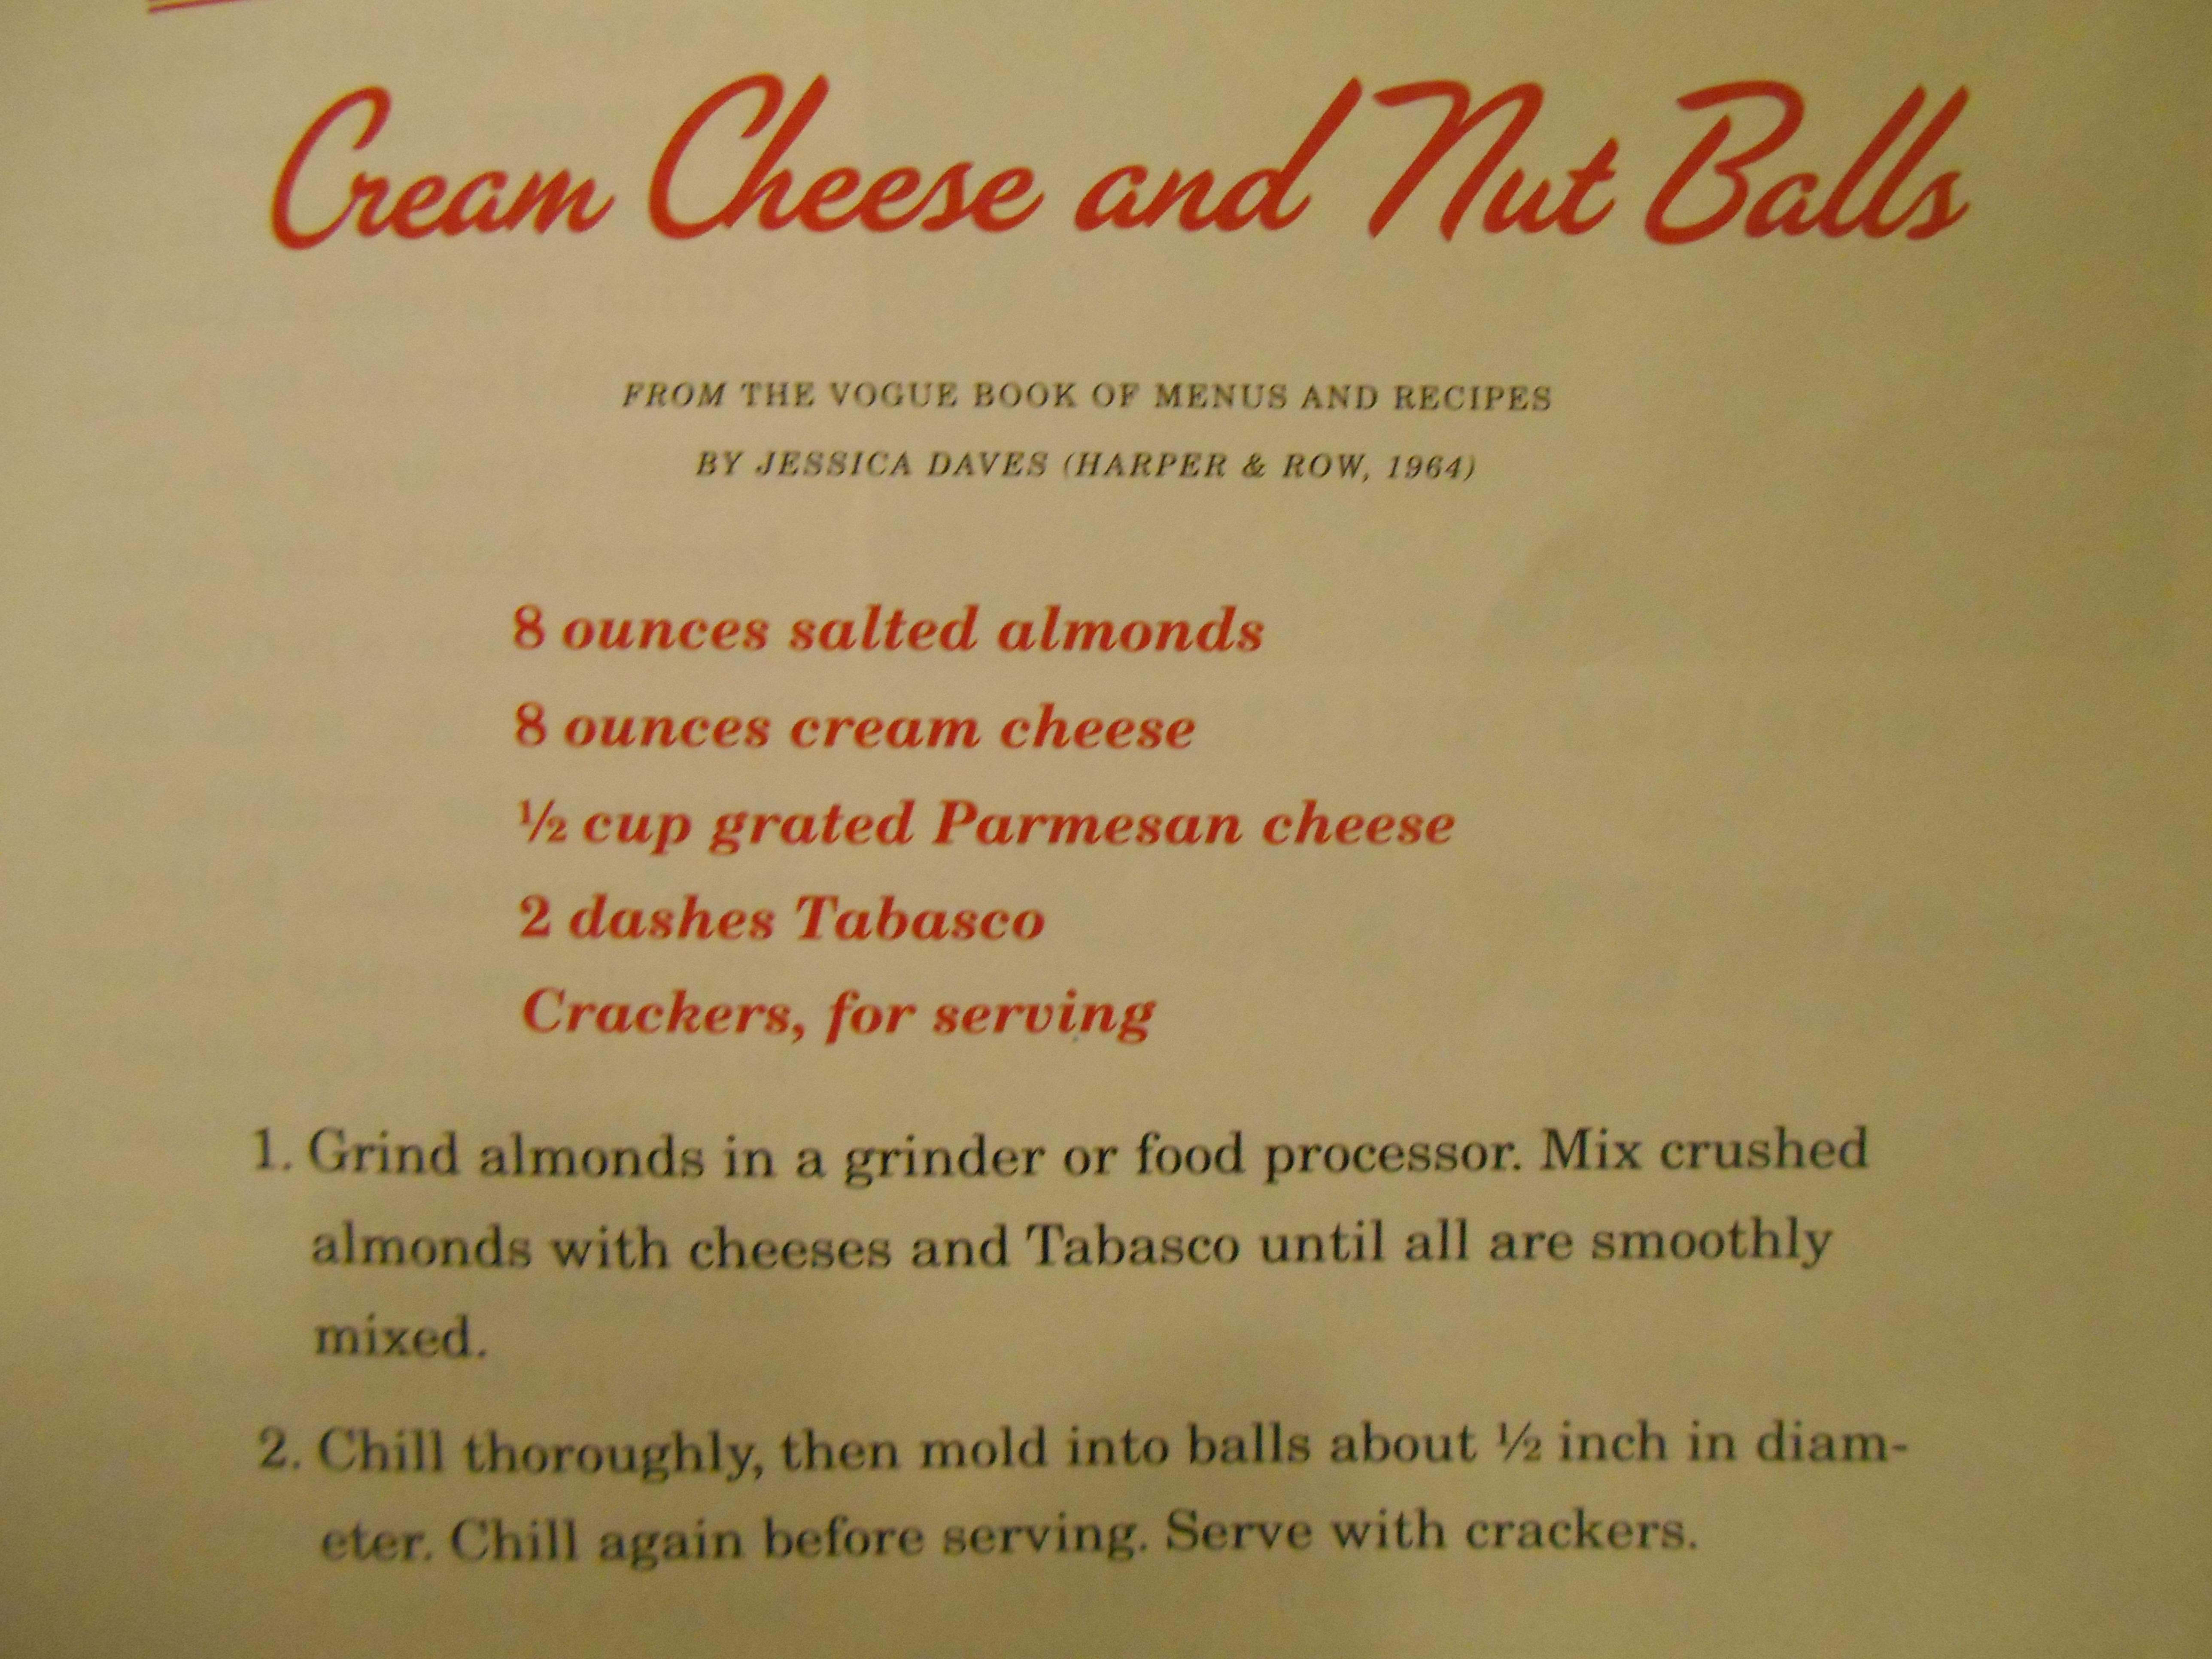 Cream Cheese and Nut Balls